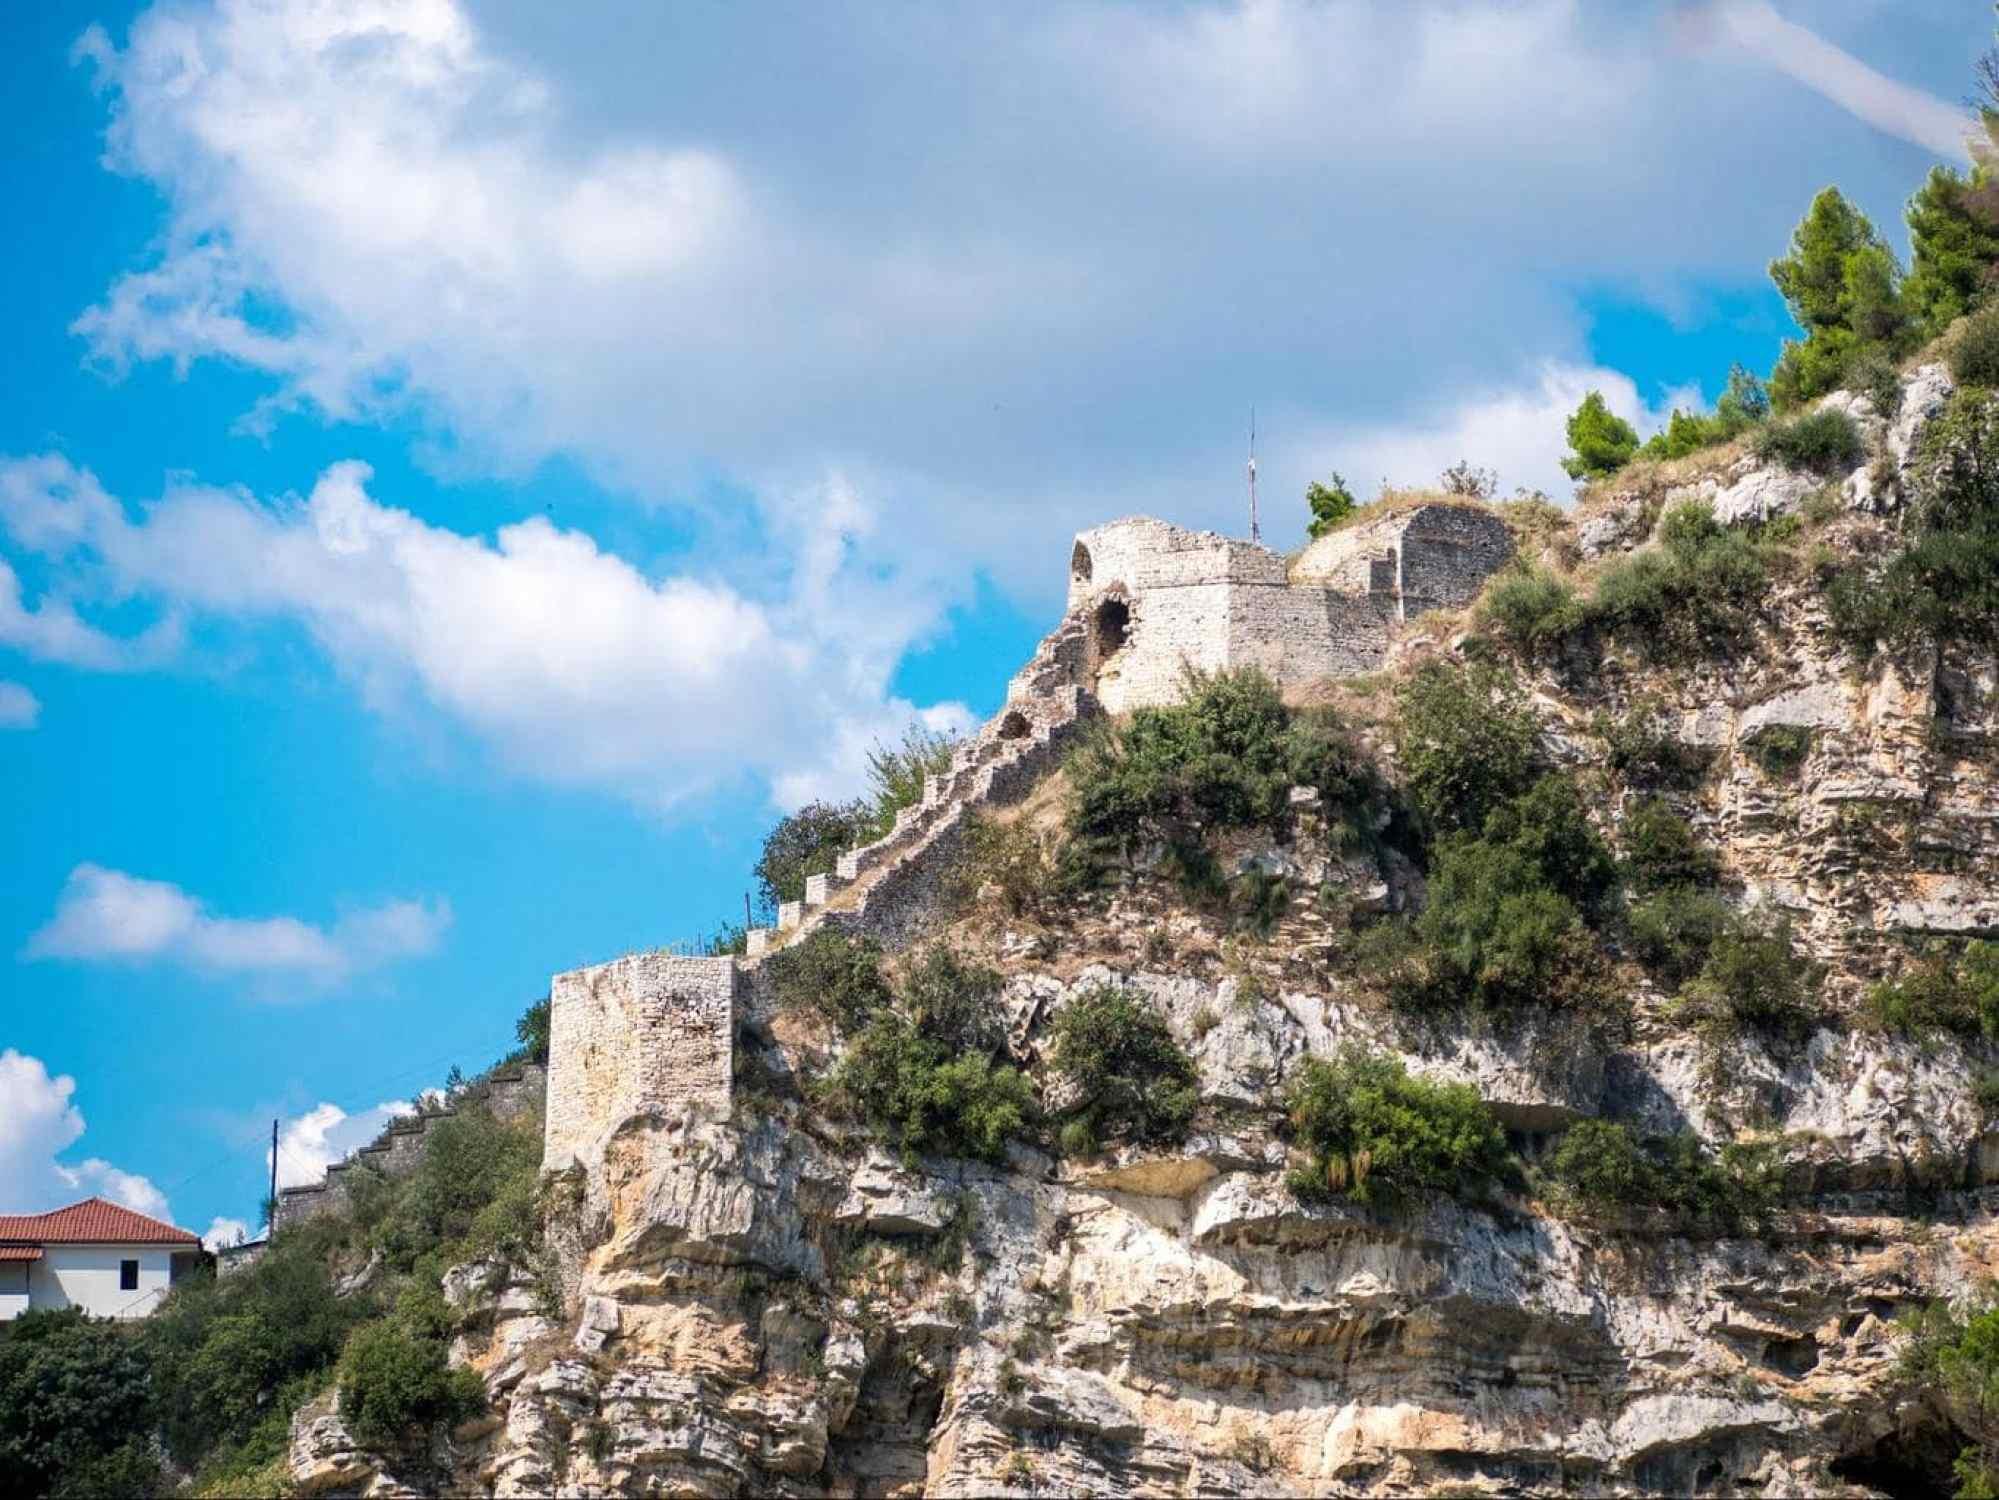 Gallery walls of Berat